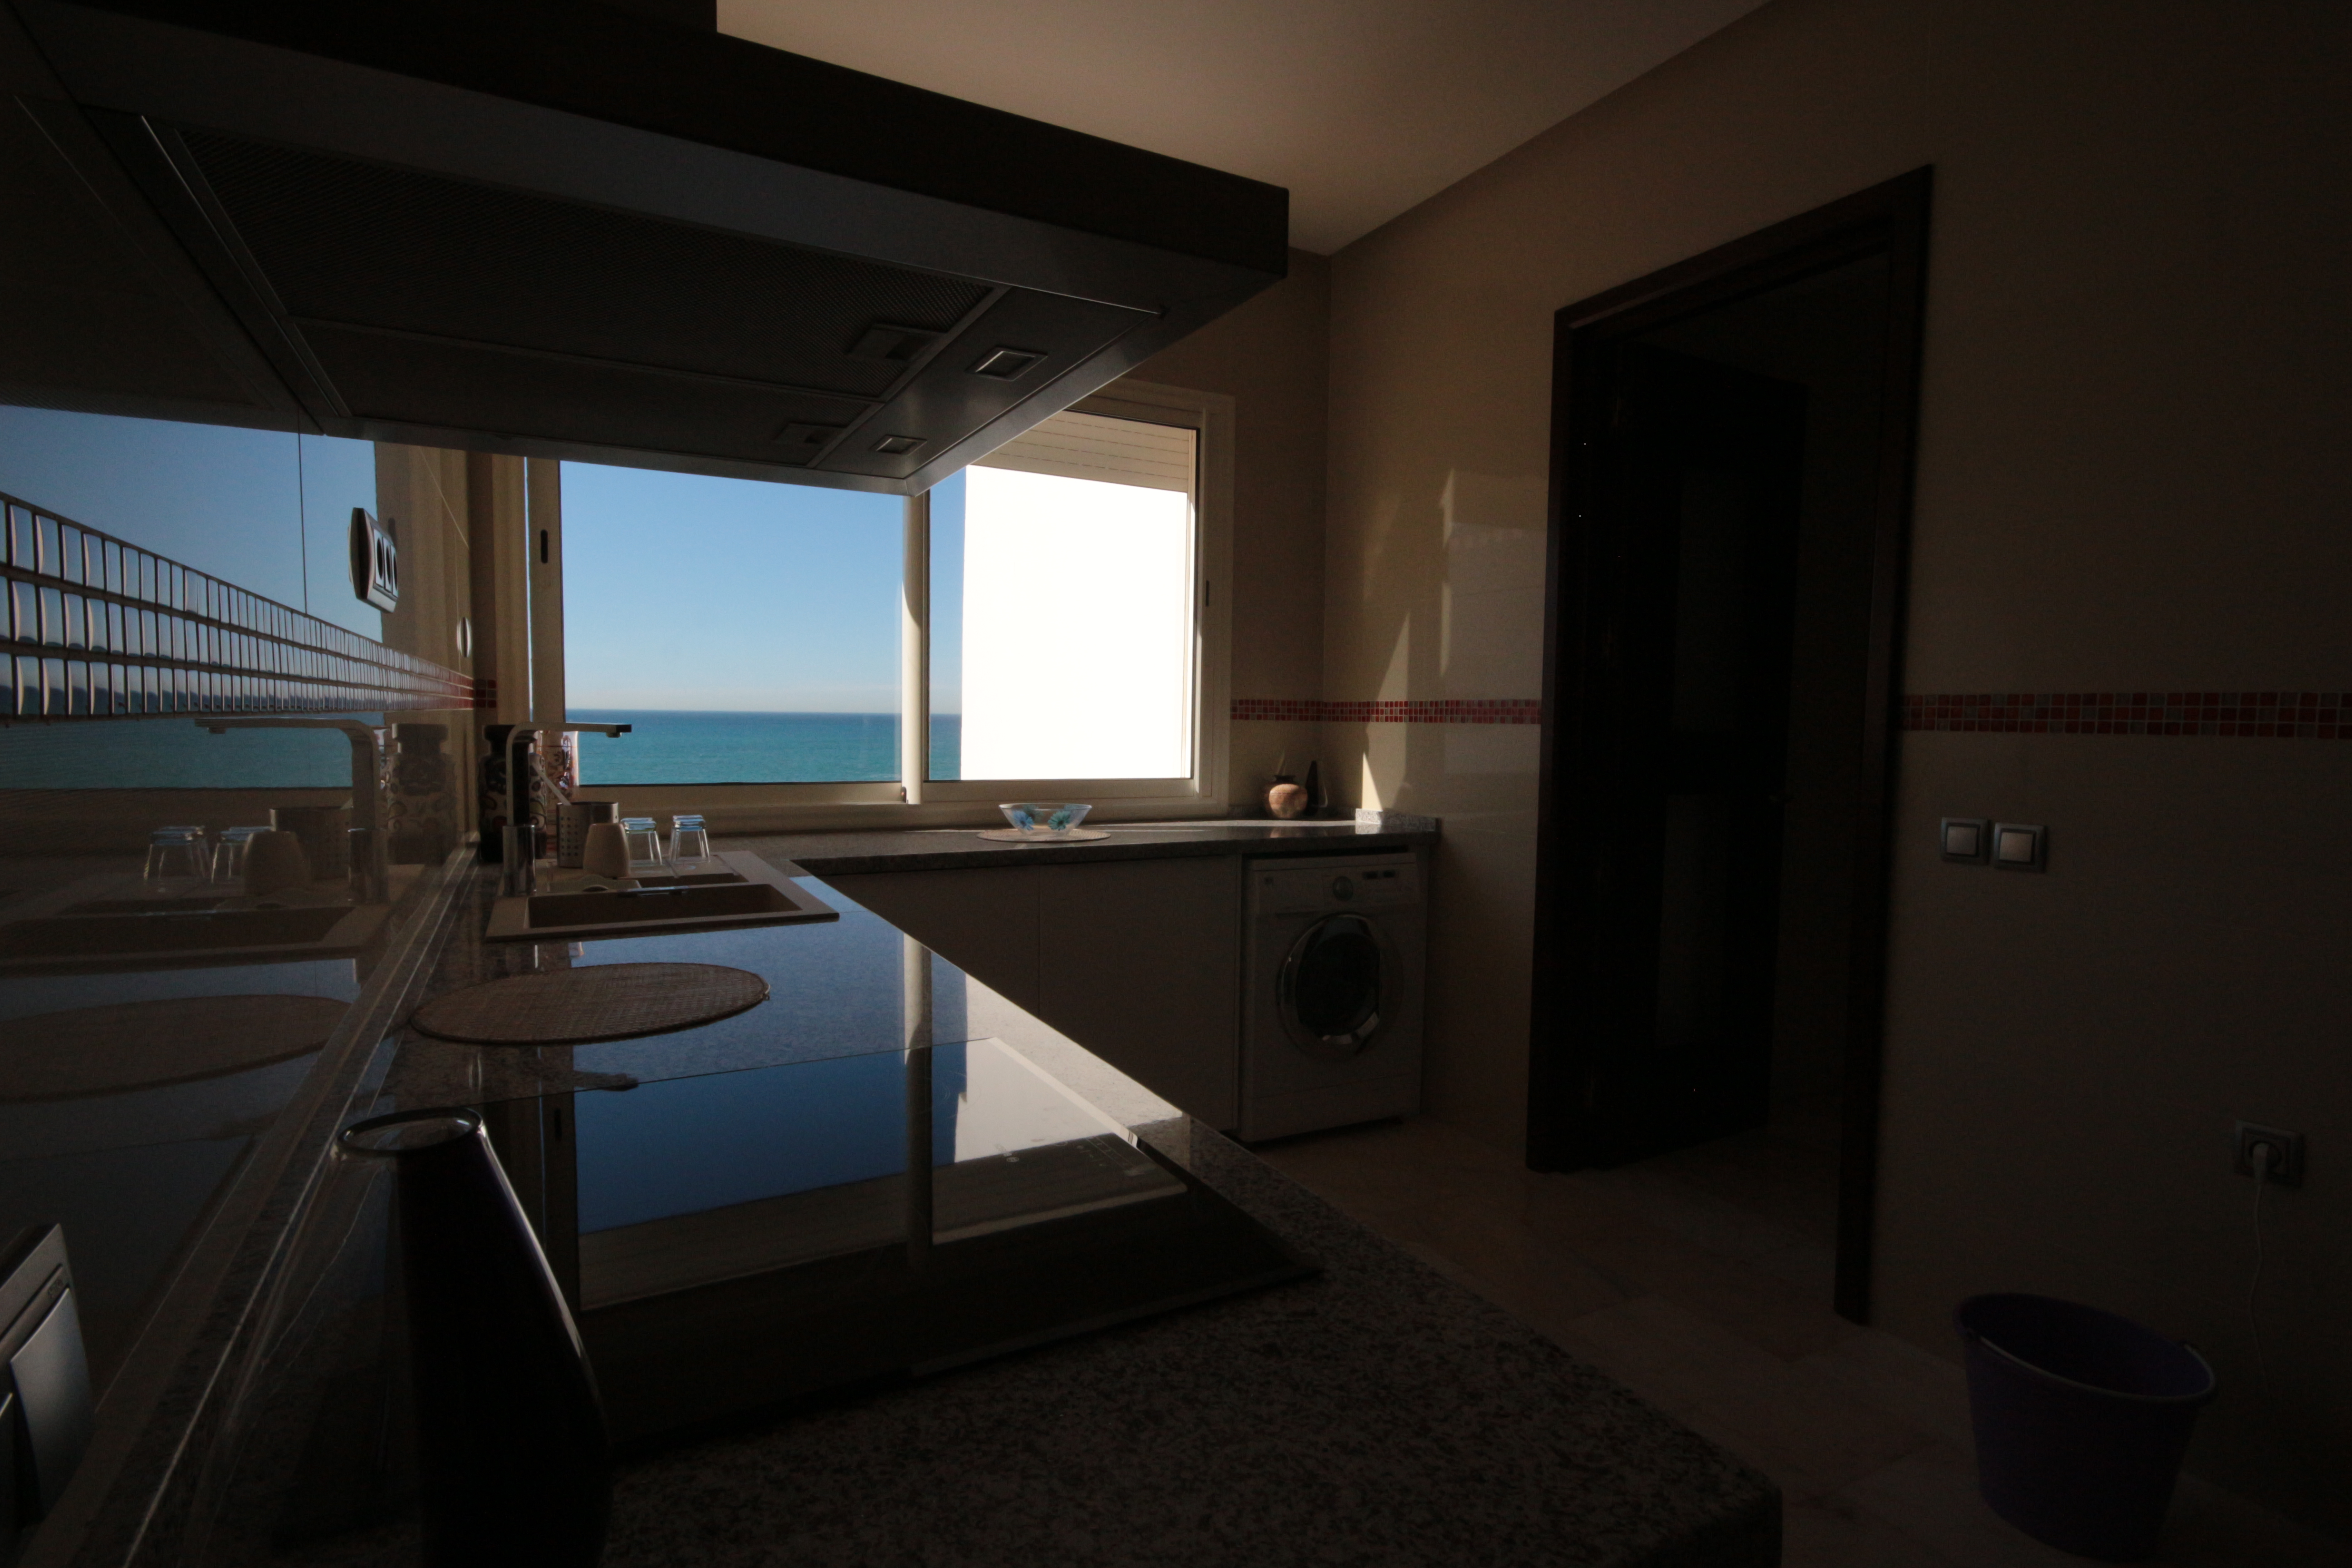 Verkoop 2 slaapkamers tanger tangeri marokko avenue du front de mer gandori complex - Slaapkamer marokko ...